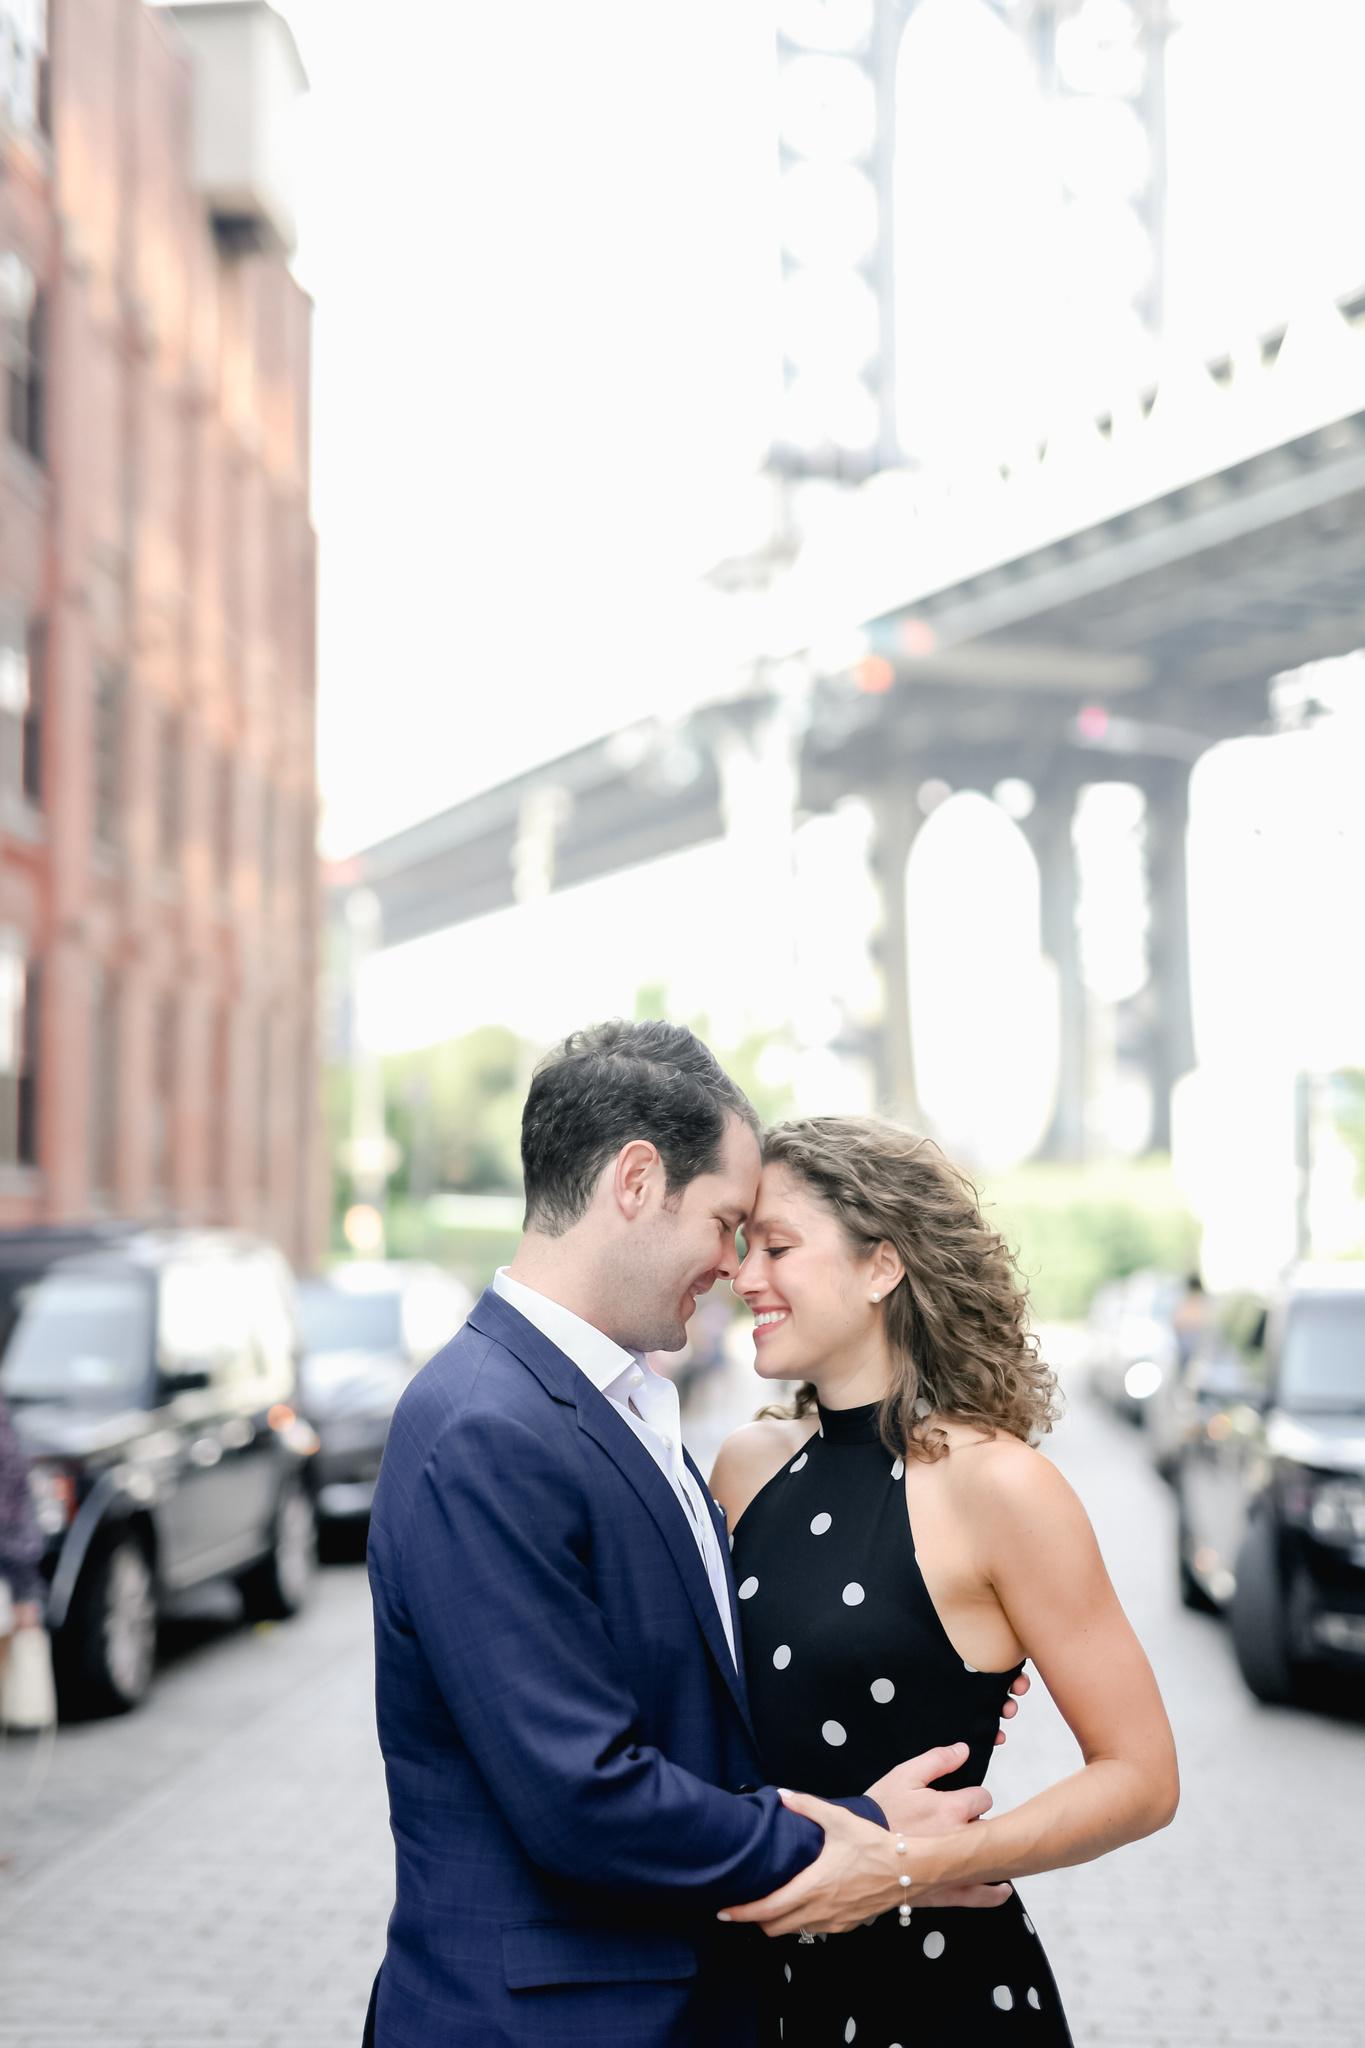 nyc engagement photos_nyc elopement_ct wedding photographer-5.jpg